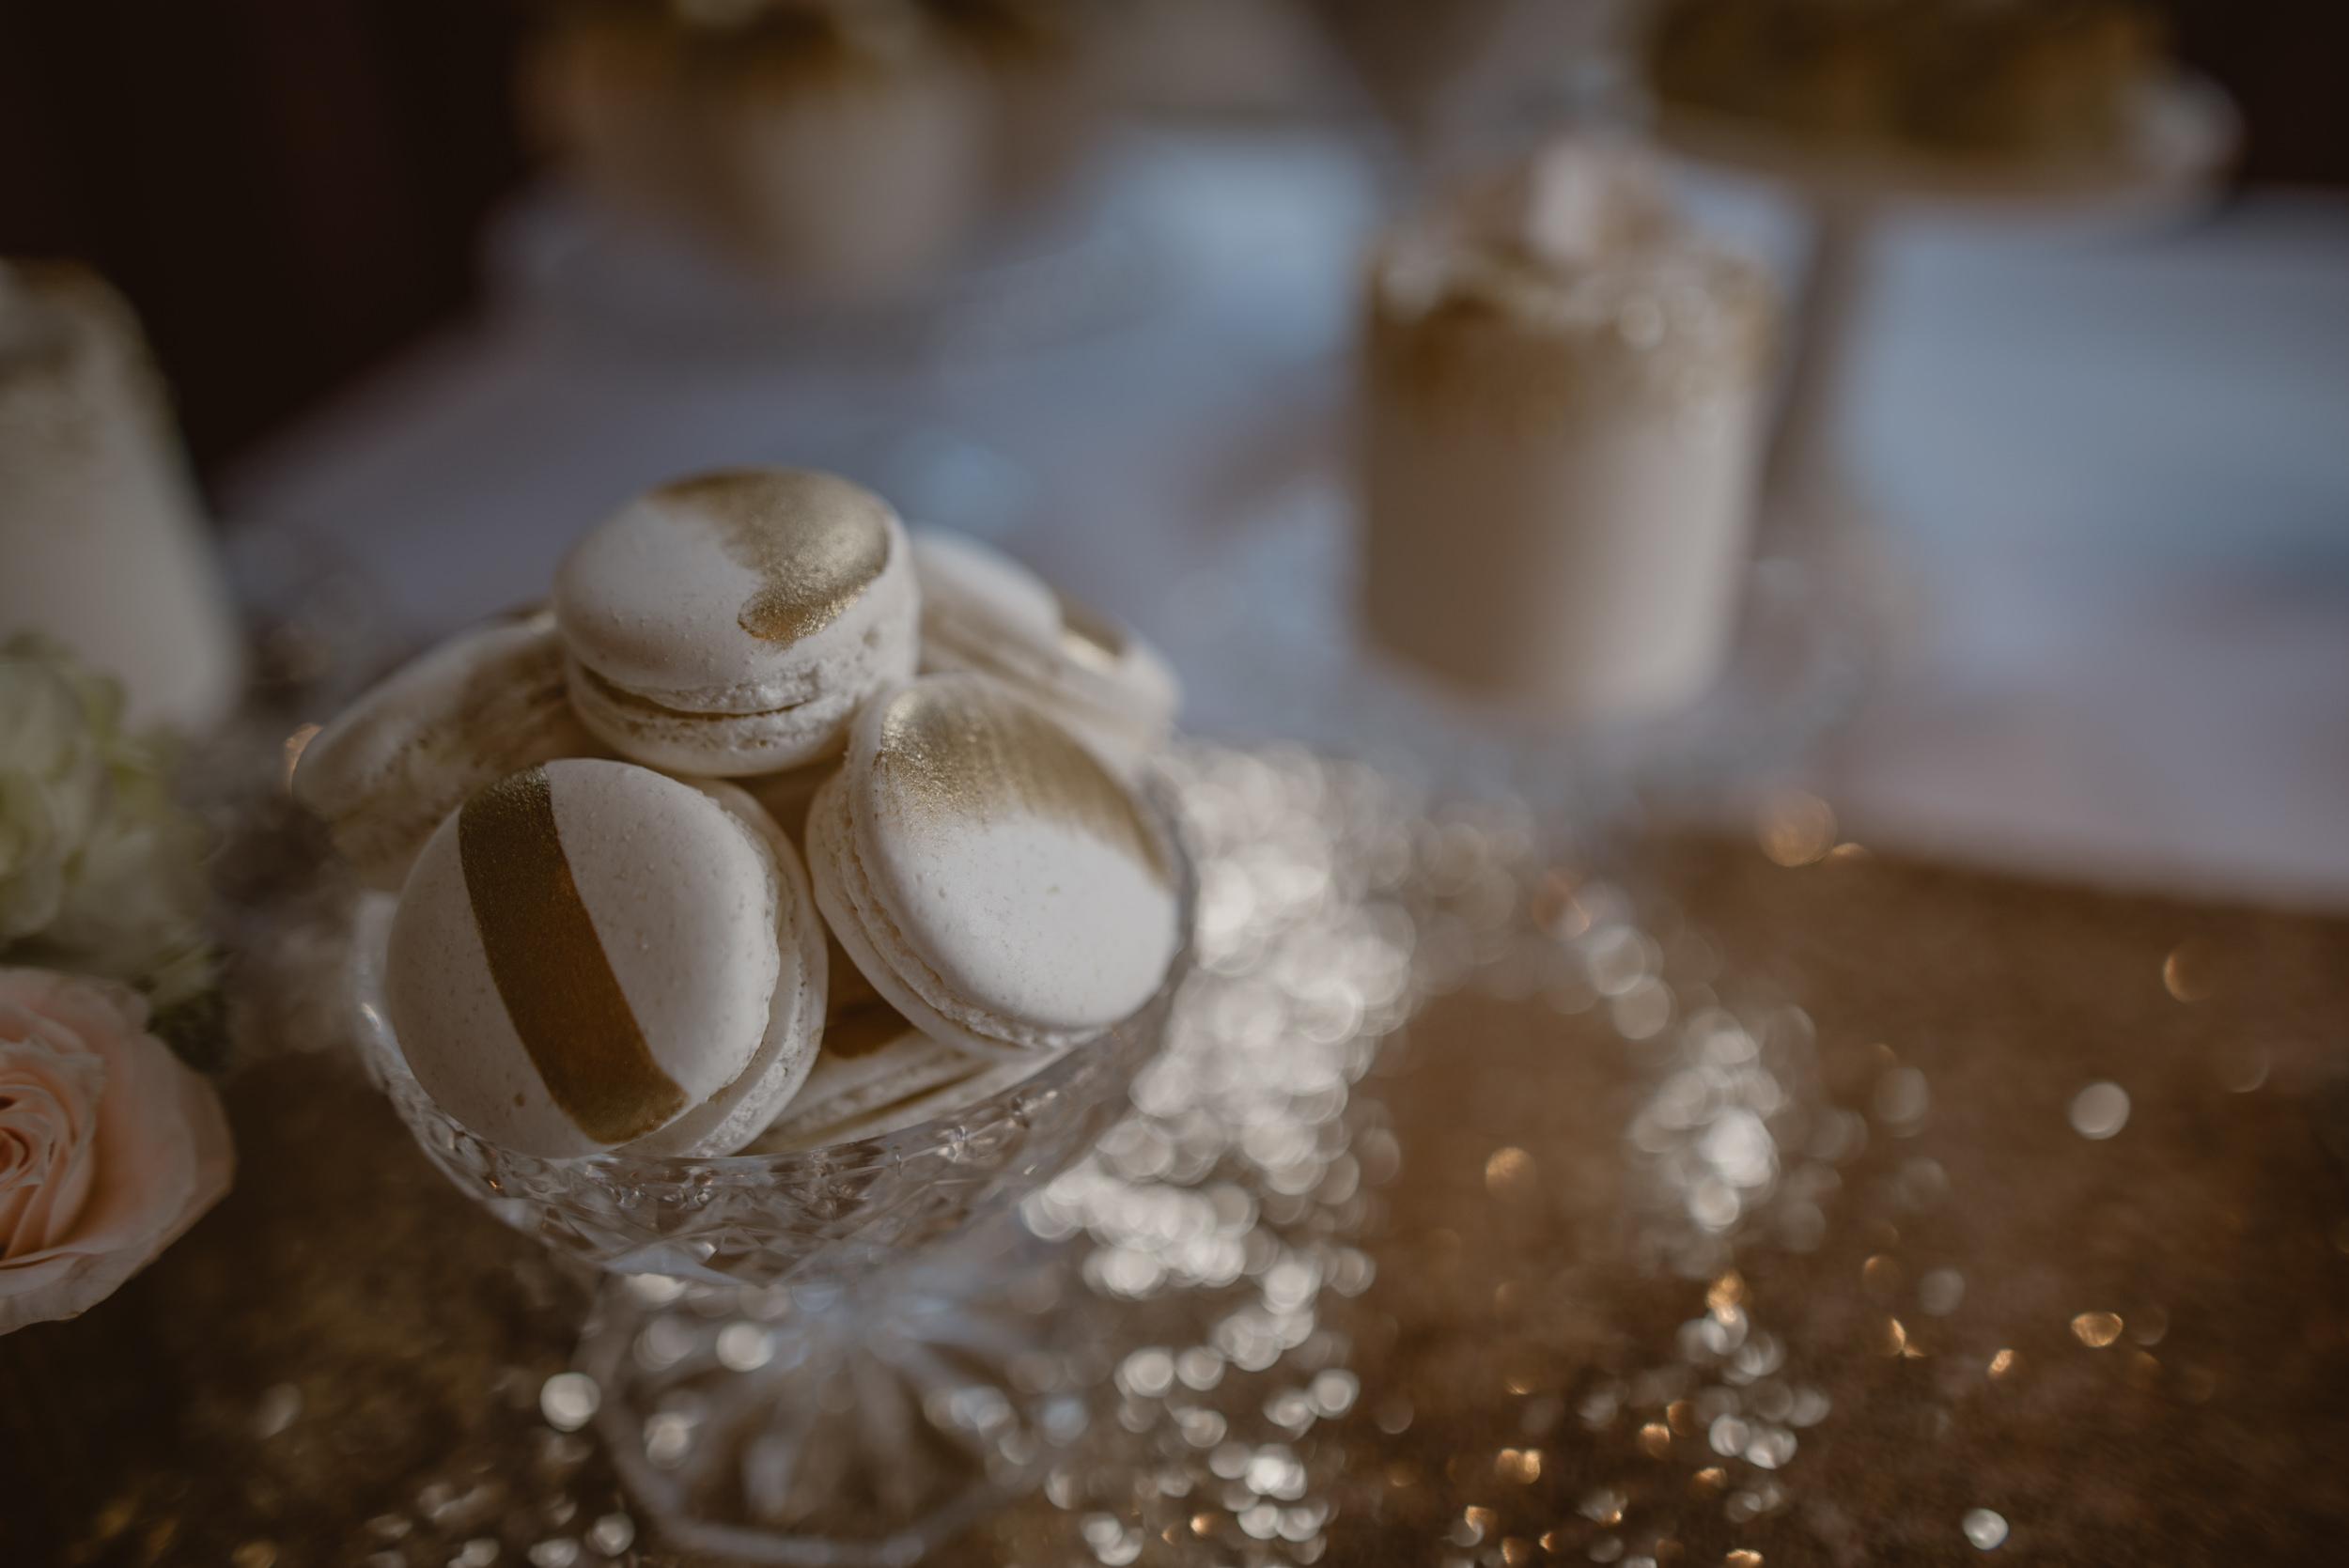 Trisha-and-Roger-wedding-The-Priory-Church-and-Chewton-Glen-Hotel-Christchurch-Manu-Mendoza-Wedding-Photography-253.jpg